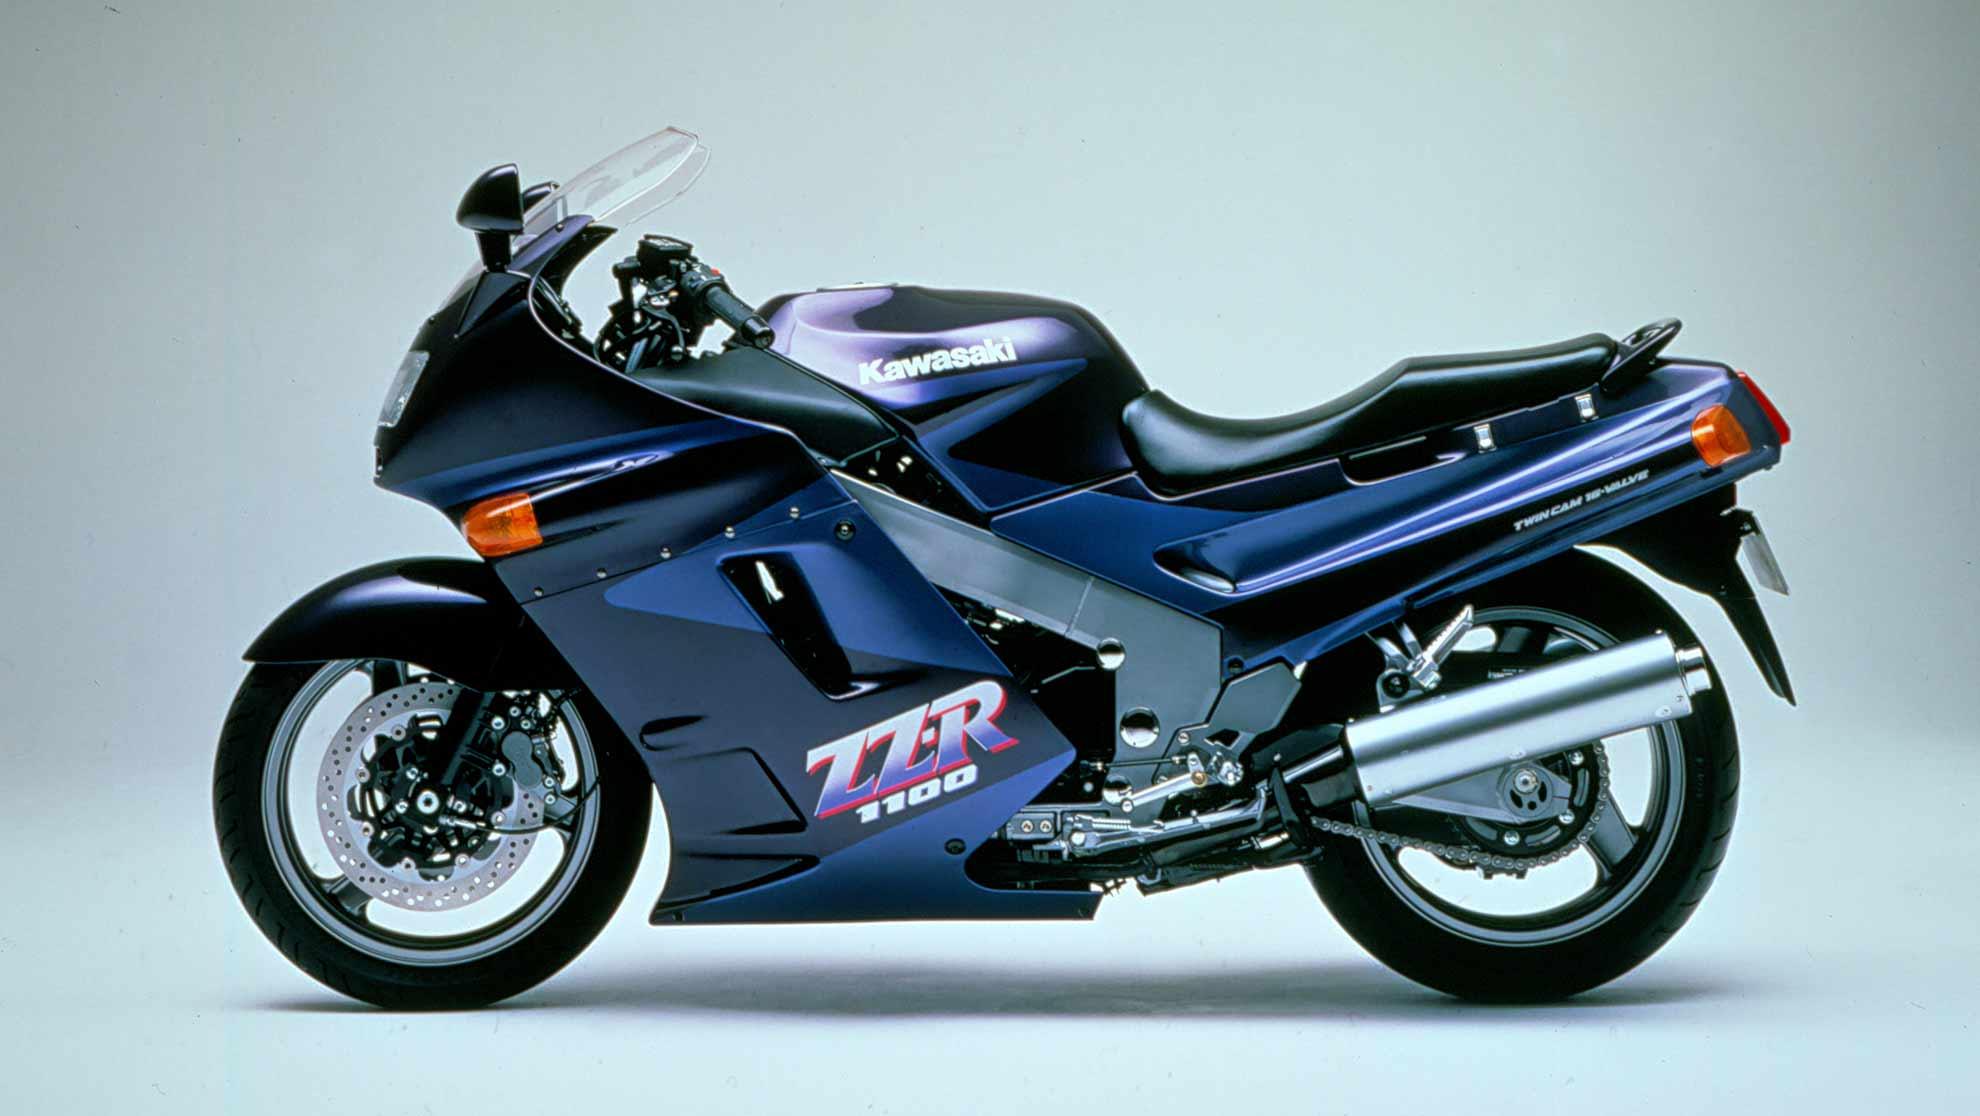 1991k-gross--ZZ-R1100-6x7-cm-Dia-Standbild-1991